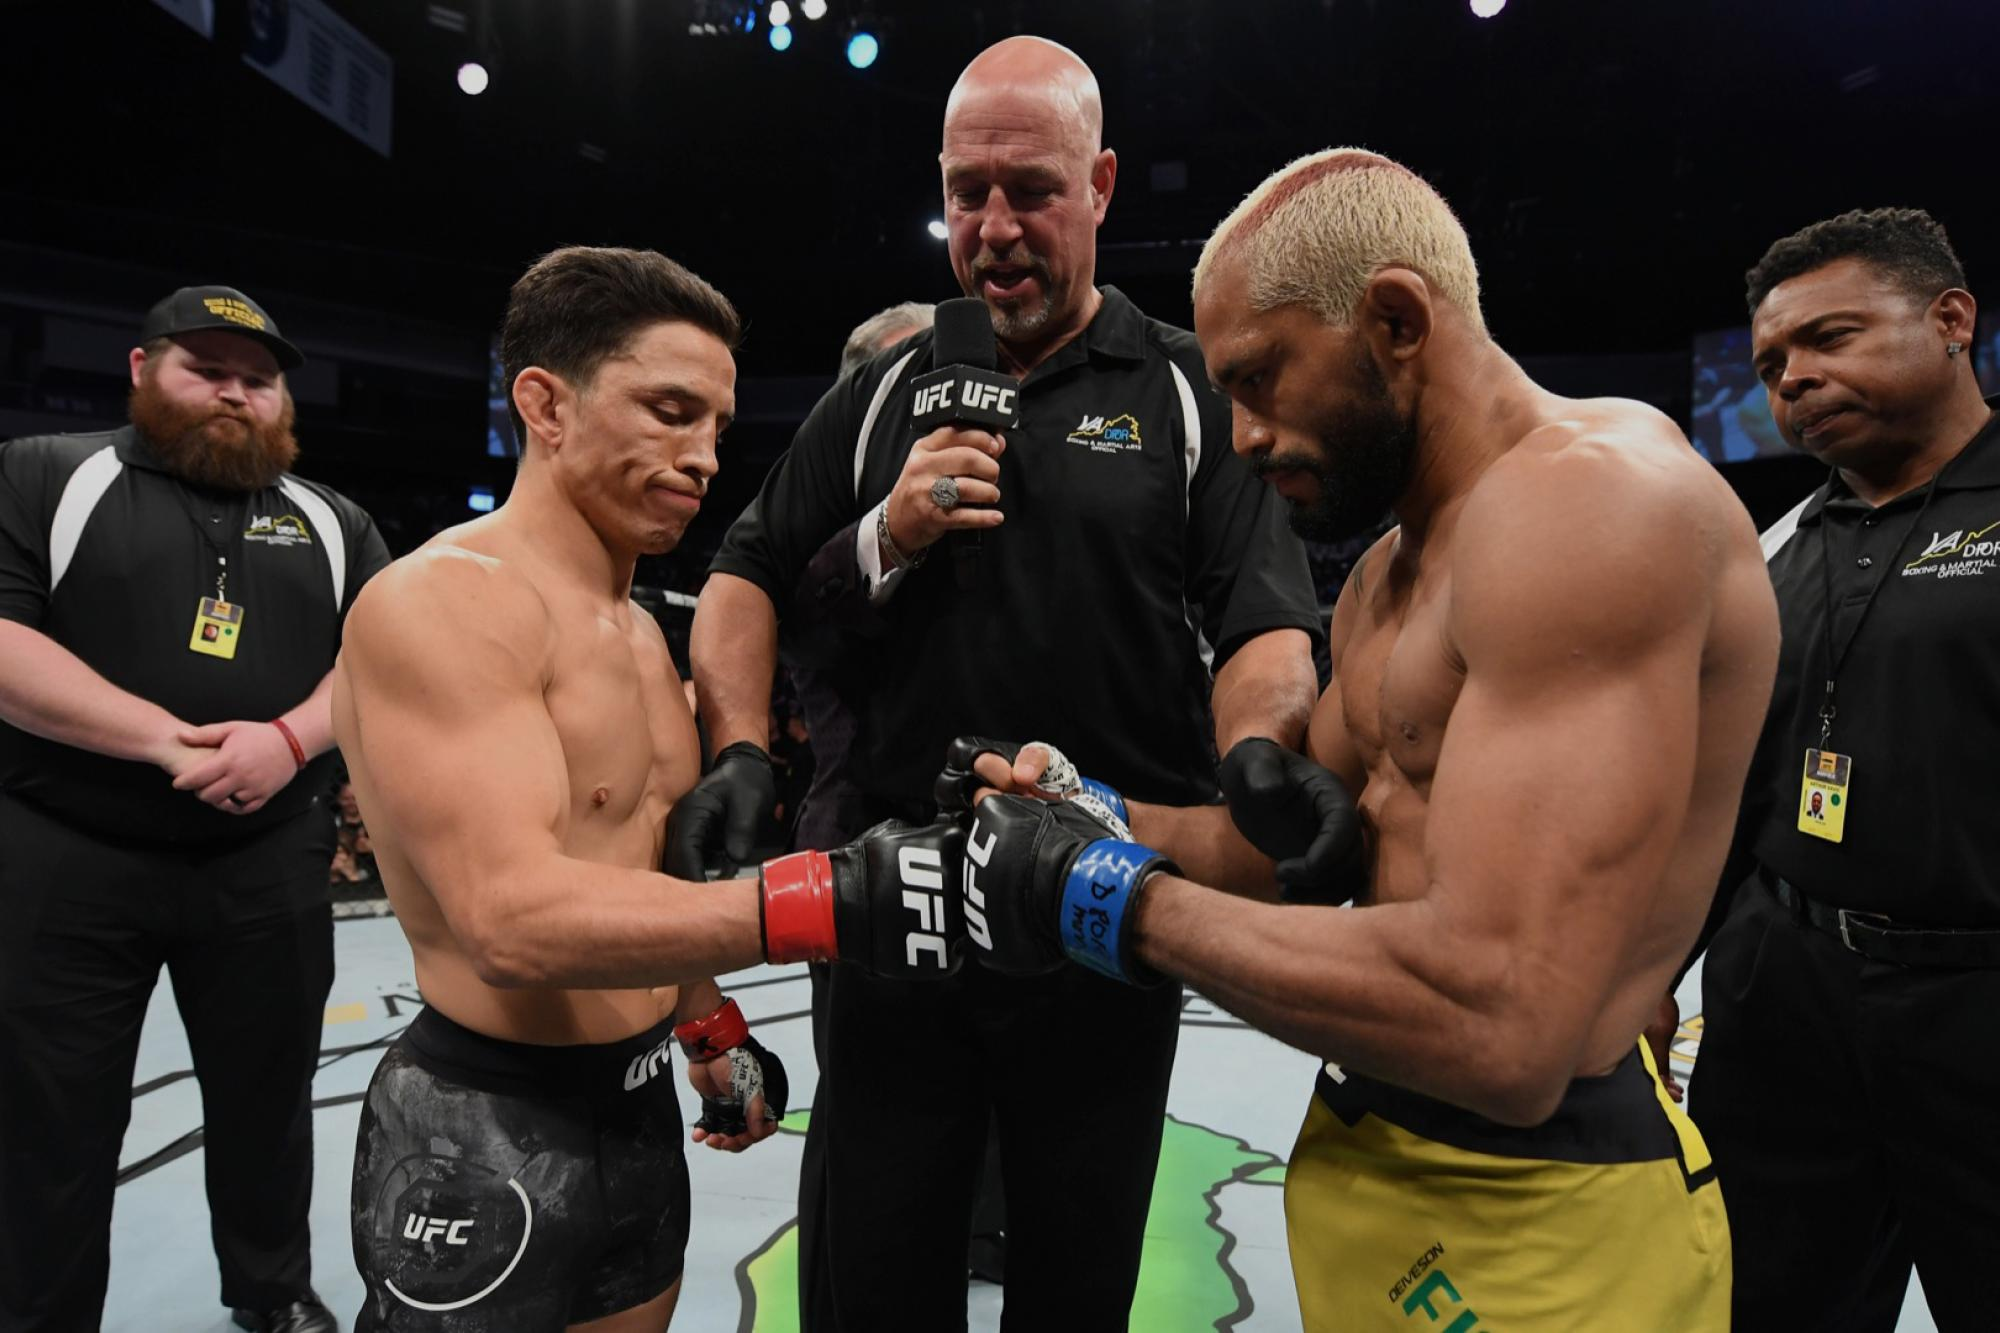 Ufc Fight Night Figueiredo Vs Benavidez 2 Results Winner Interviews And More Ufc